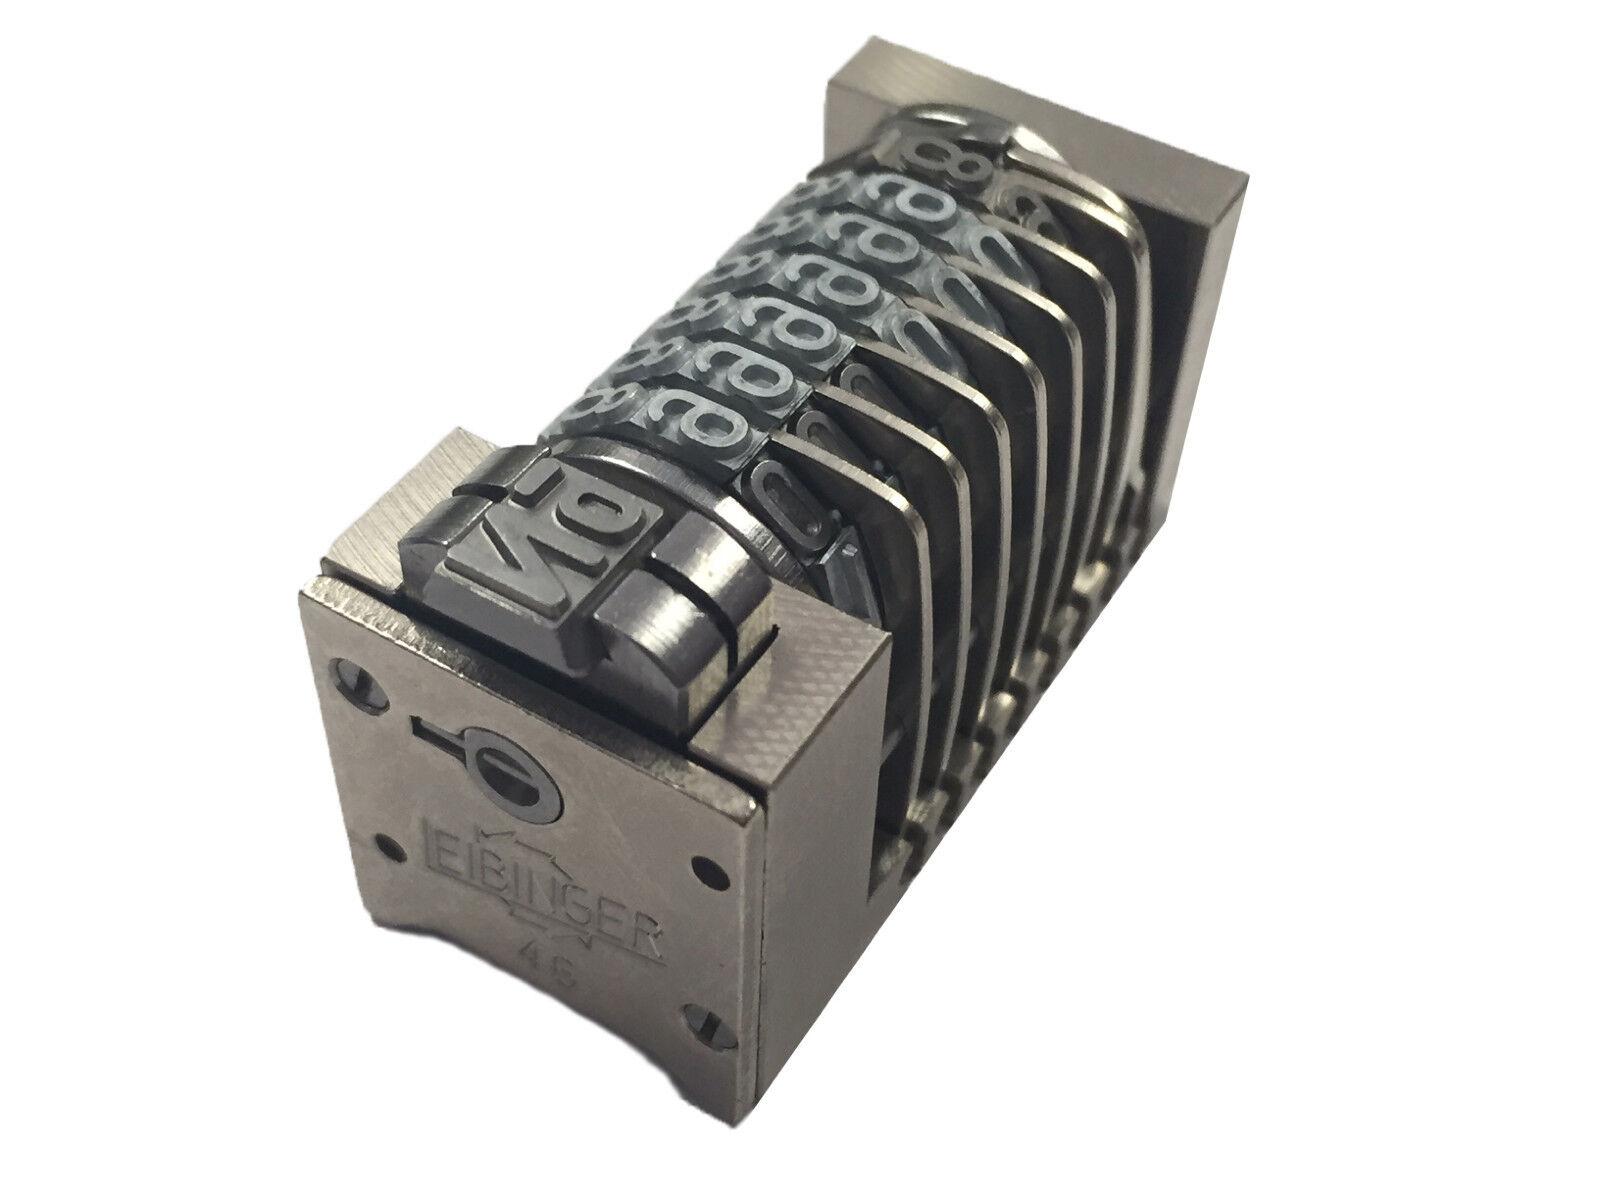 Details about Leibinger Letterpress Numbering Machine 7 Digit Backward  Heidelberg parts